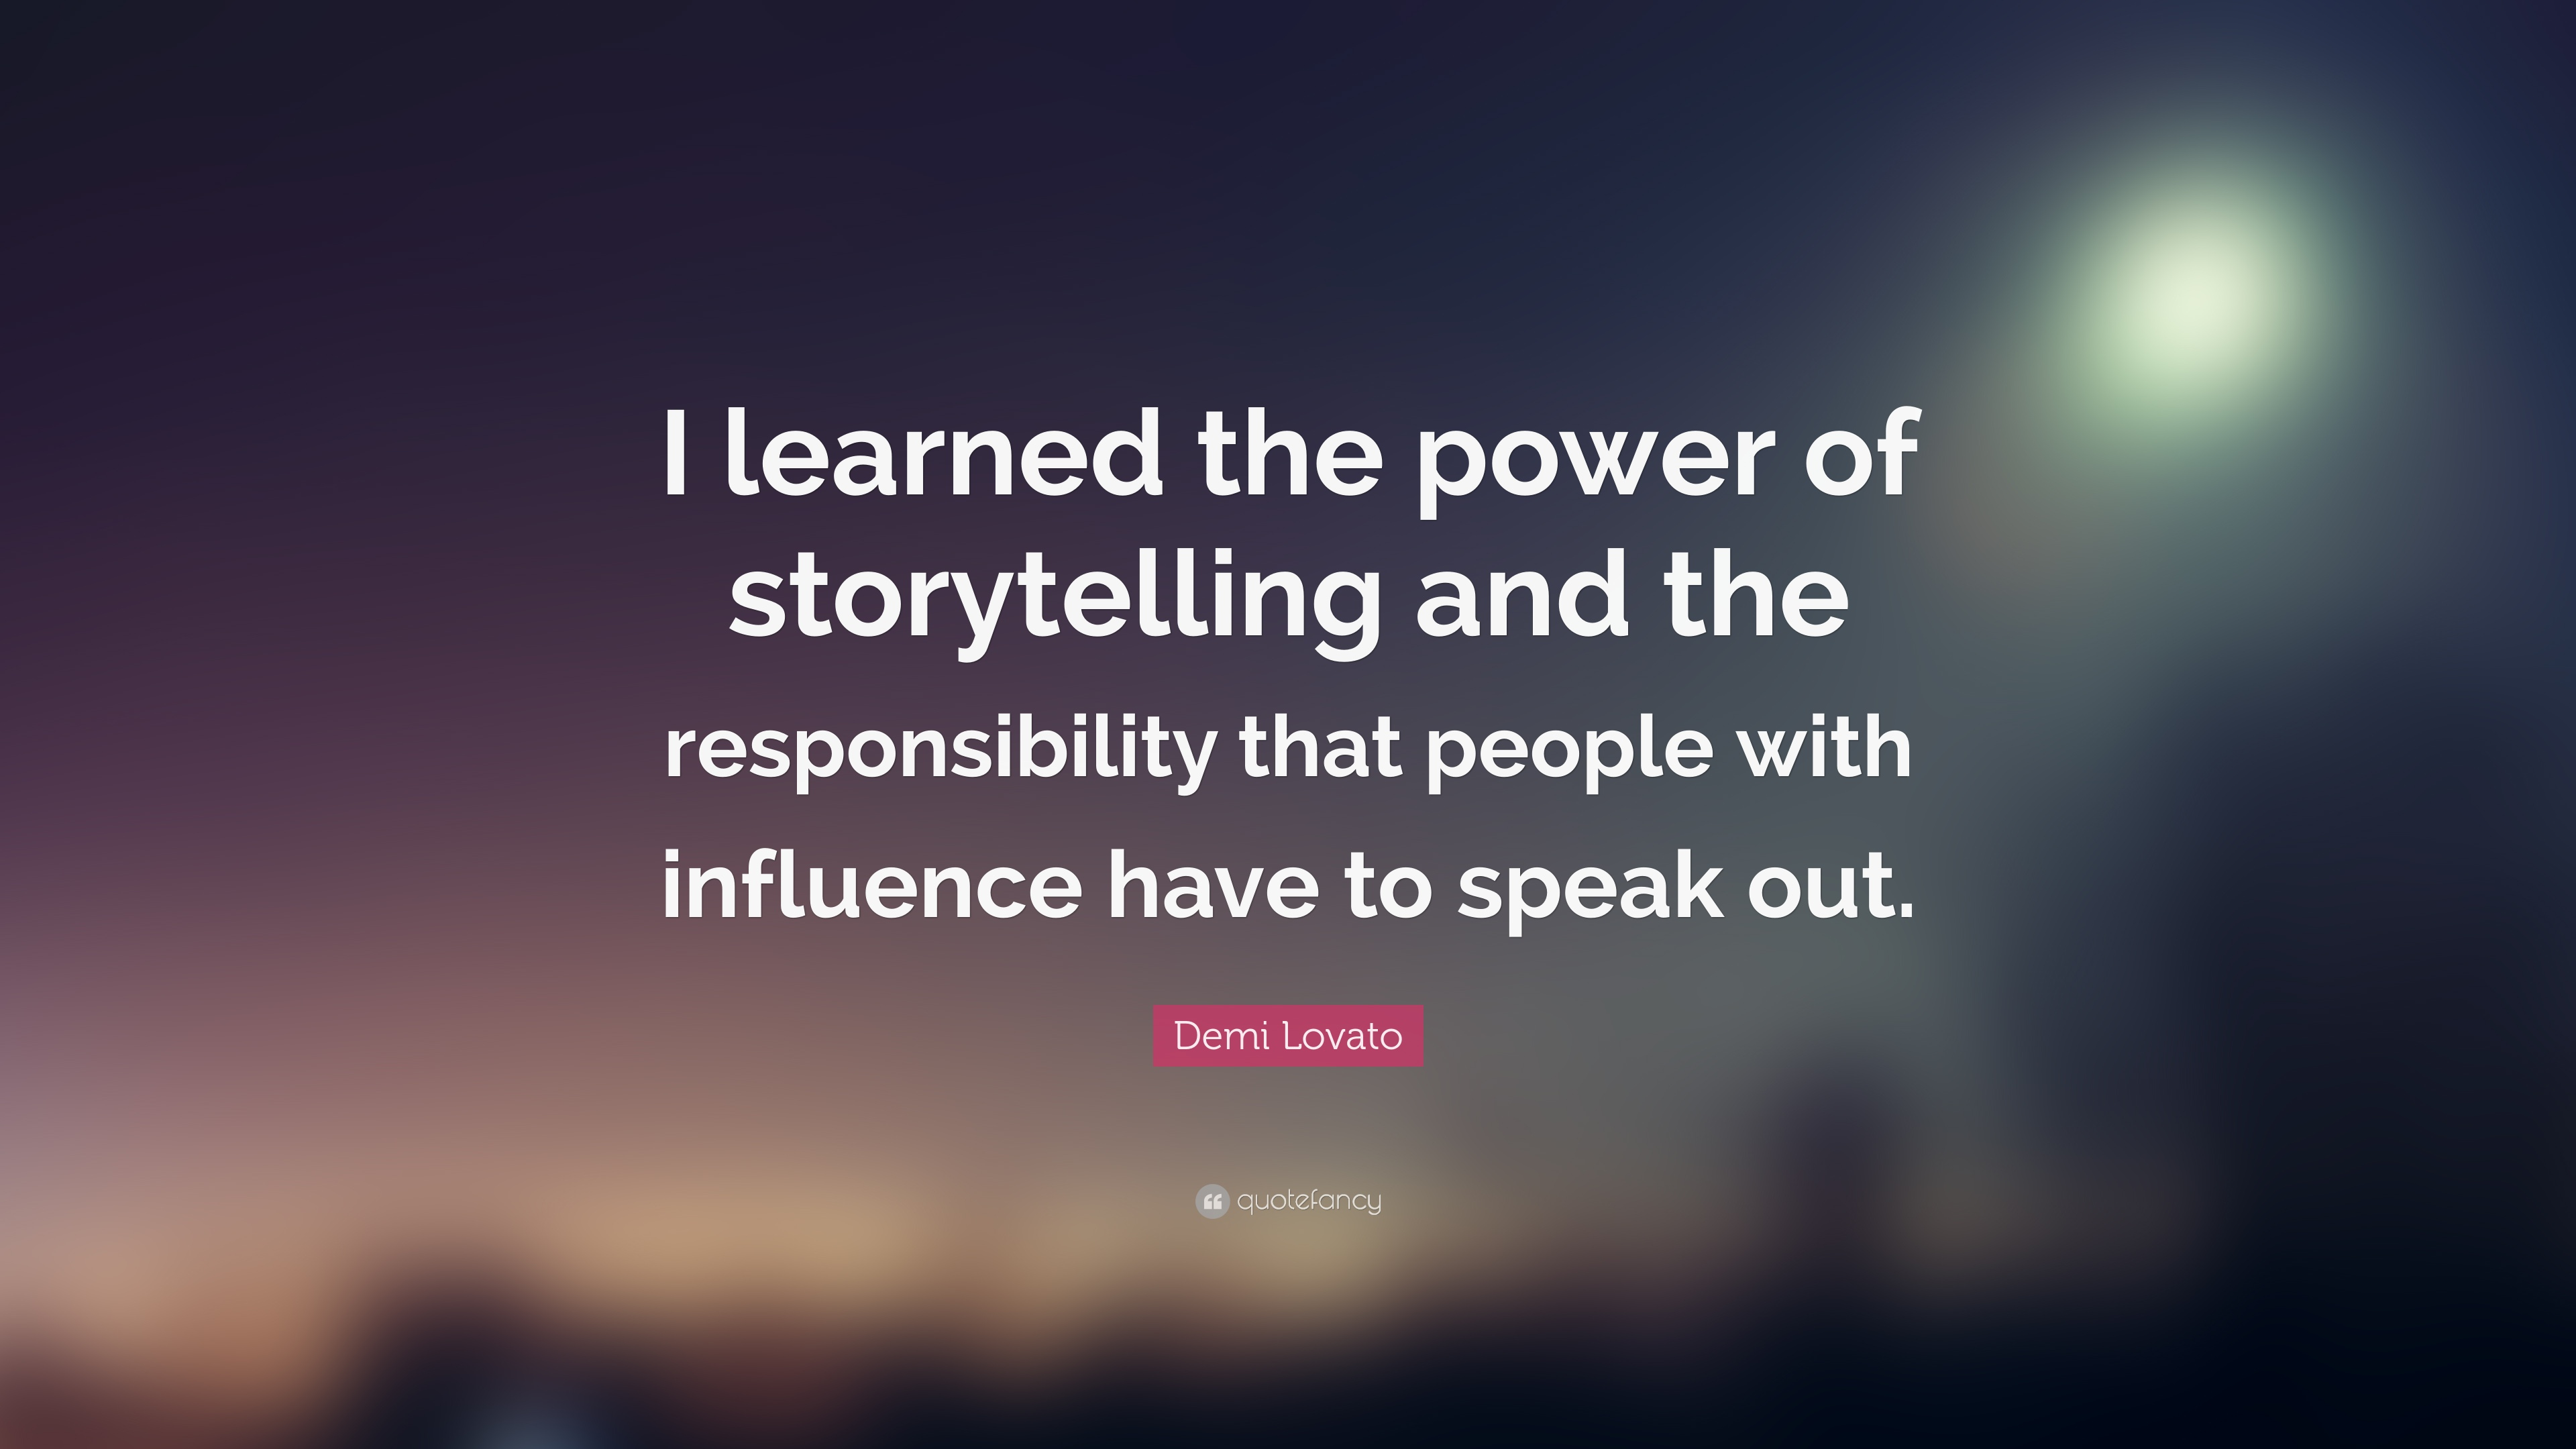 Deepak Chopra Quote Generator Storytelling Quotes Inspiration Storytelling Quotes & Sayings